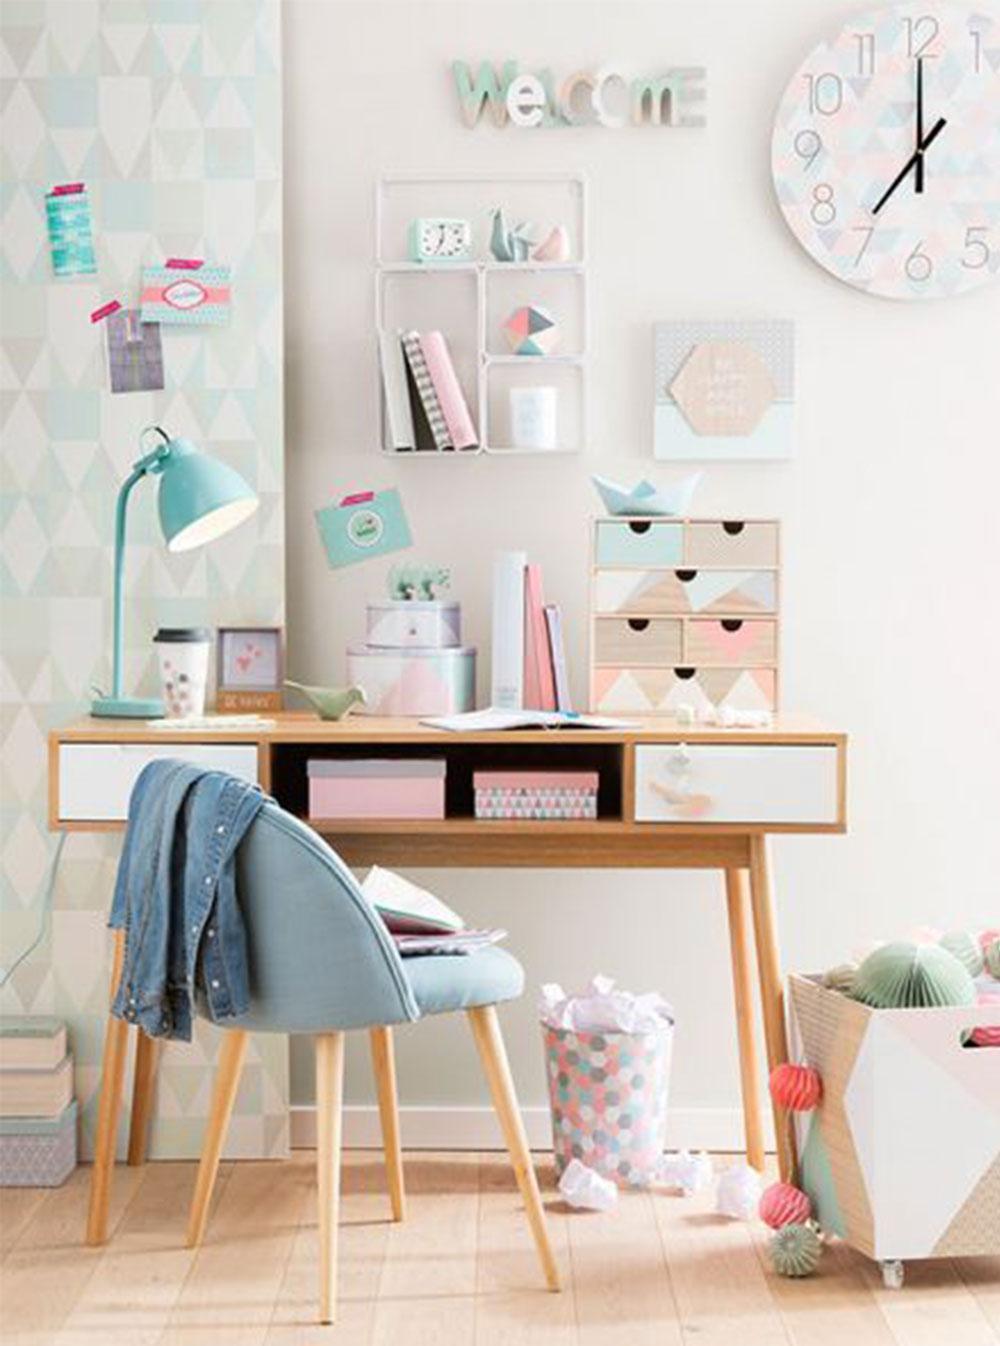 Kids Bedroom Ideas - Make homework fun